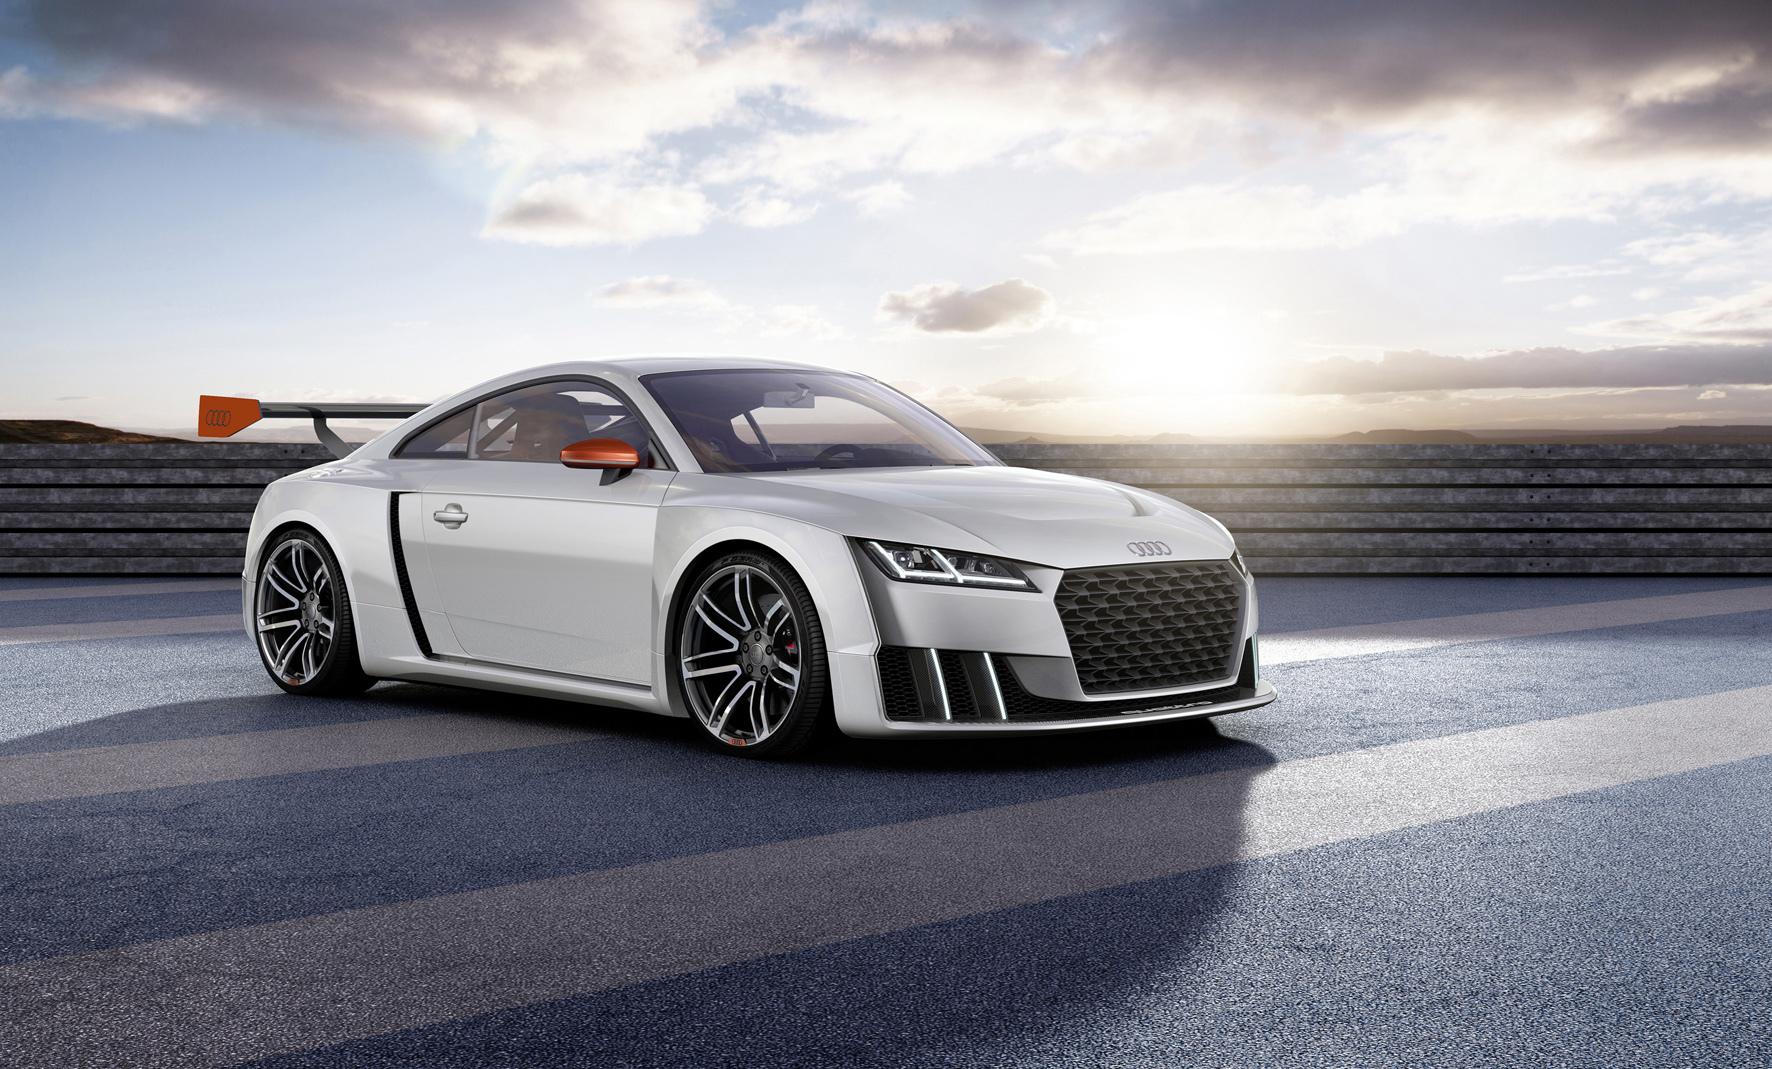 2015 Audi TT Clubsport concept